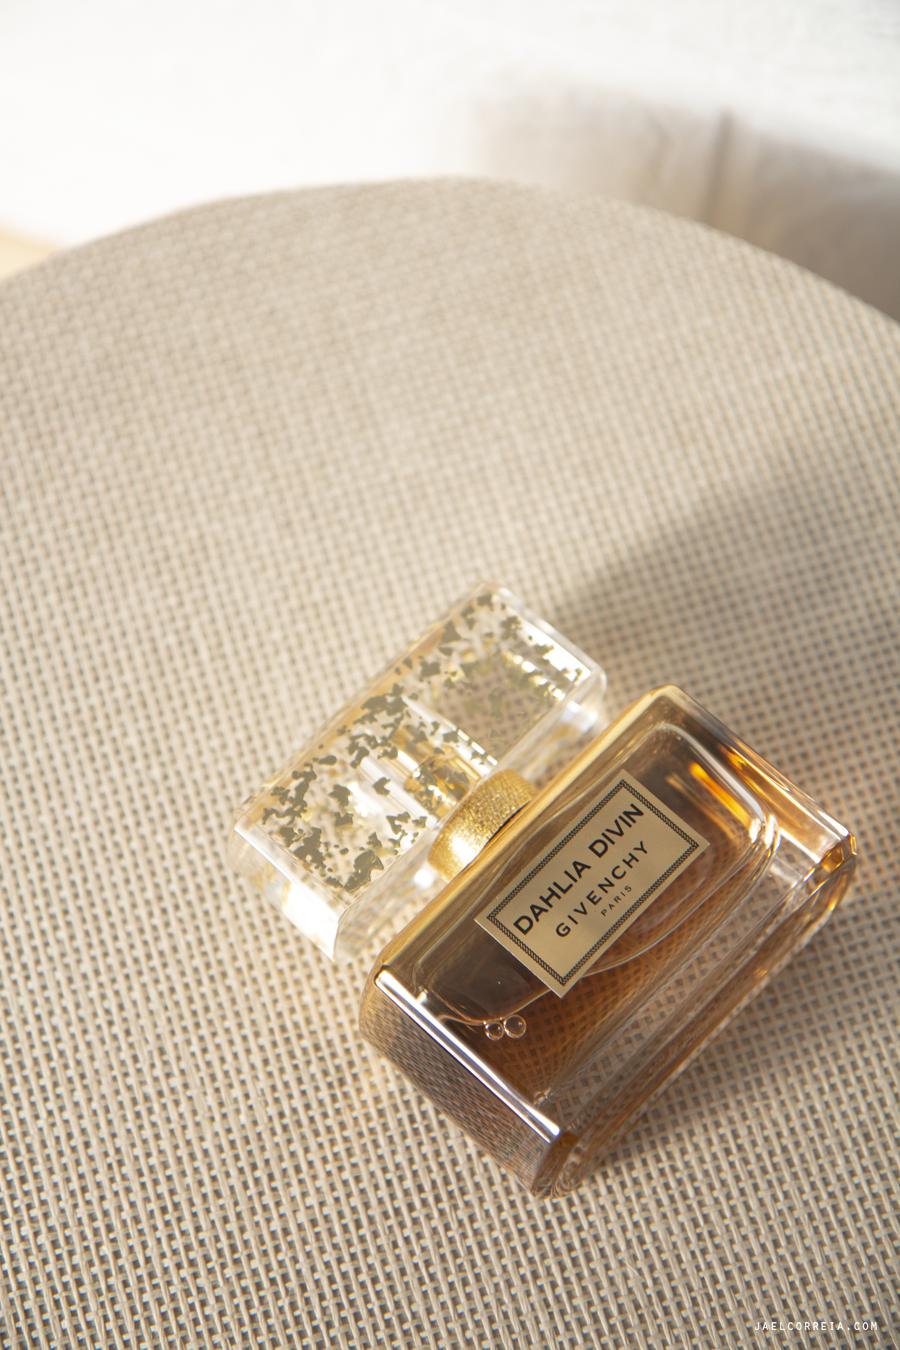 givenchy dahlia divin eau de parfum intense le nectar de parfum notino loja online cosmetica perfumaria portugal barata acessivel jael correia notas perfumes beleza 5